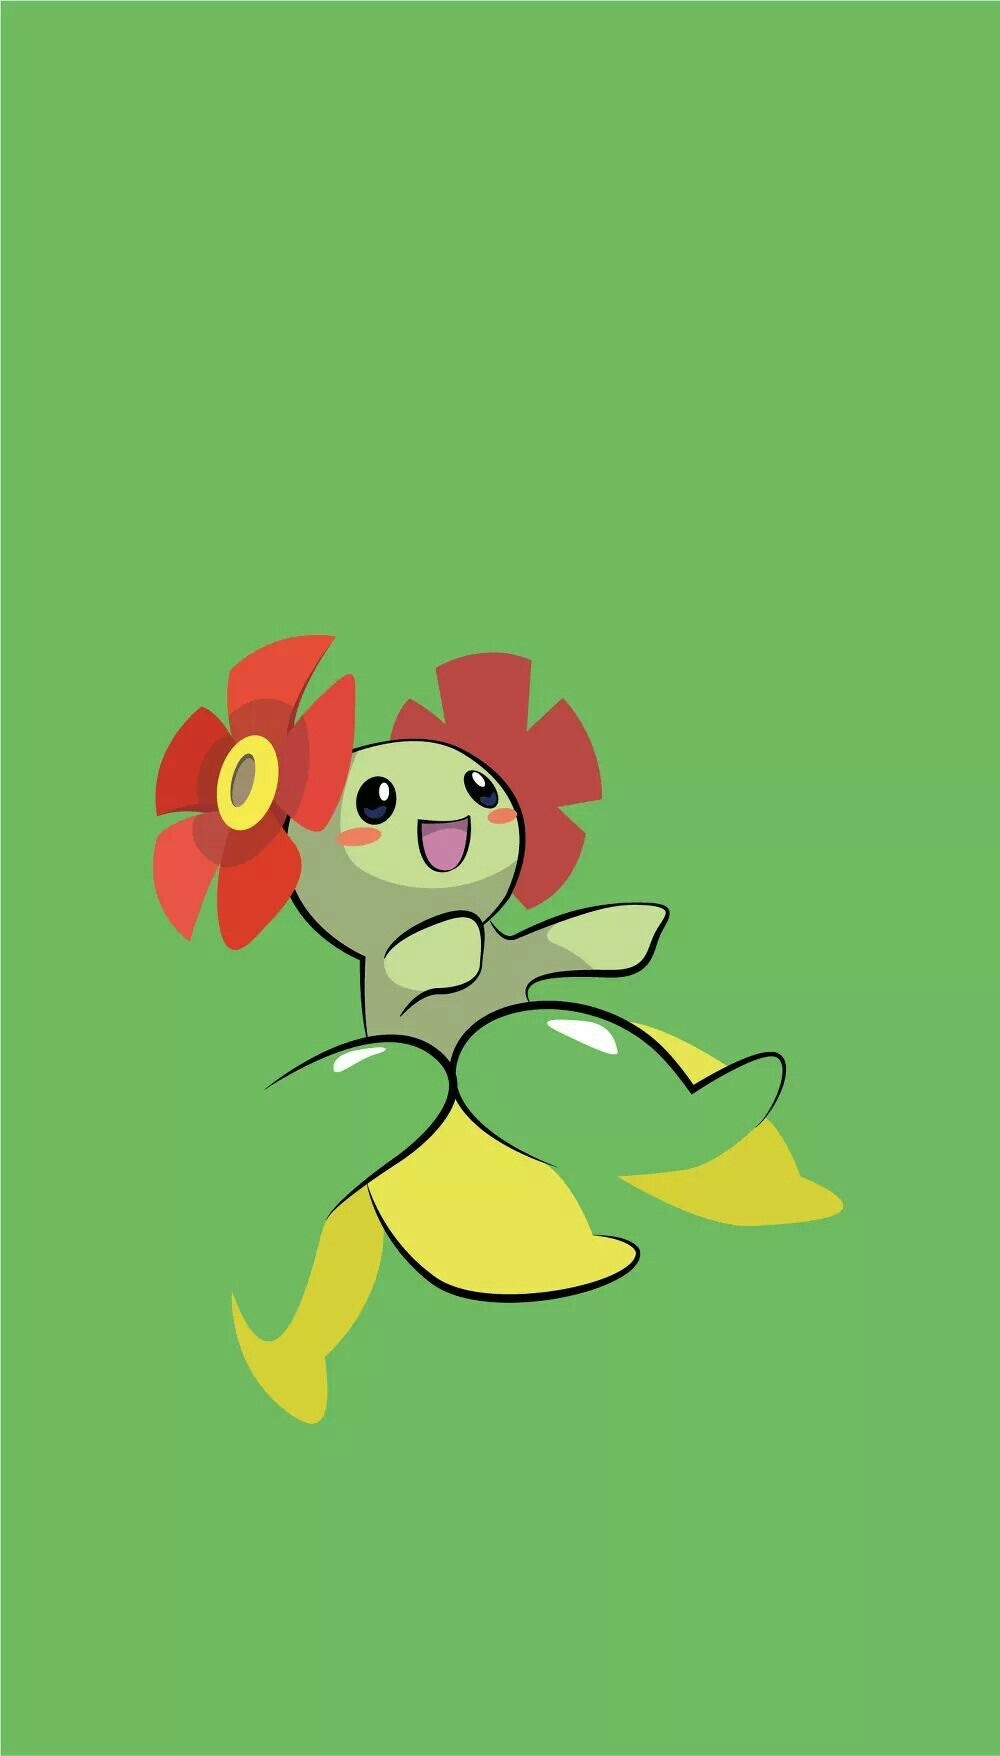 Pin by Matthew Owens on Pokémon :3!   Cute pokemon ...